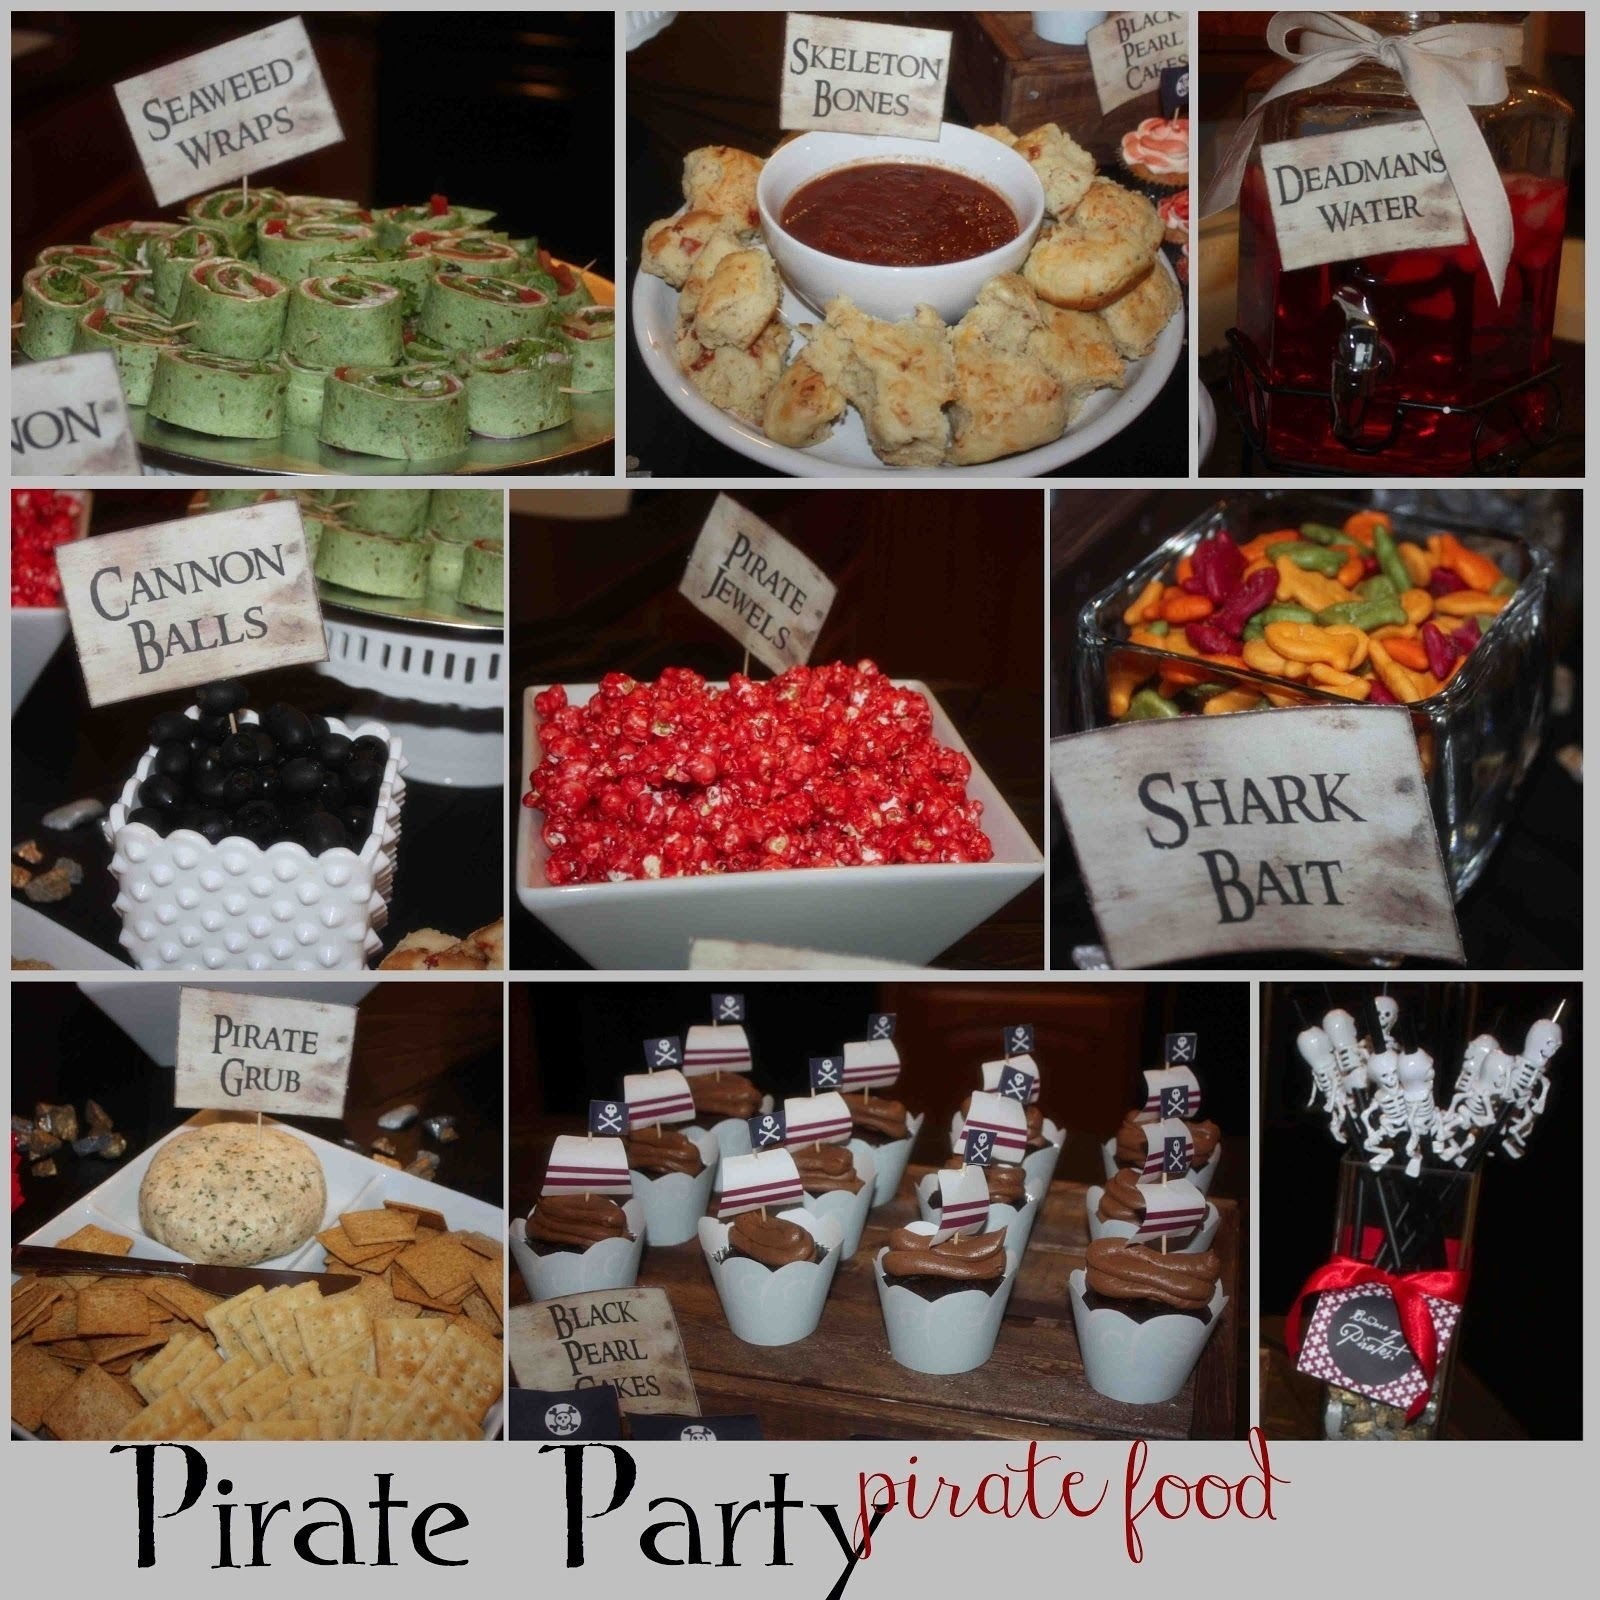 10 Stylish Pirate Birthday Party Food Ideas pirate party food ideas more pirate party ideas recipes fun 2021